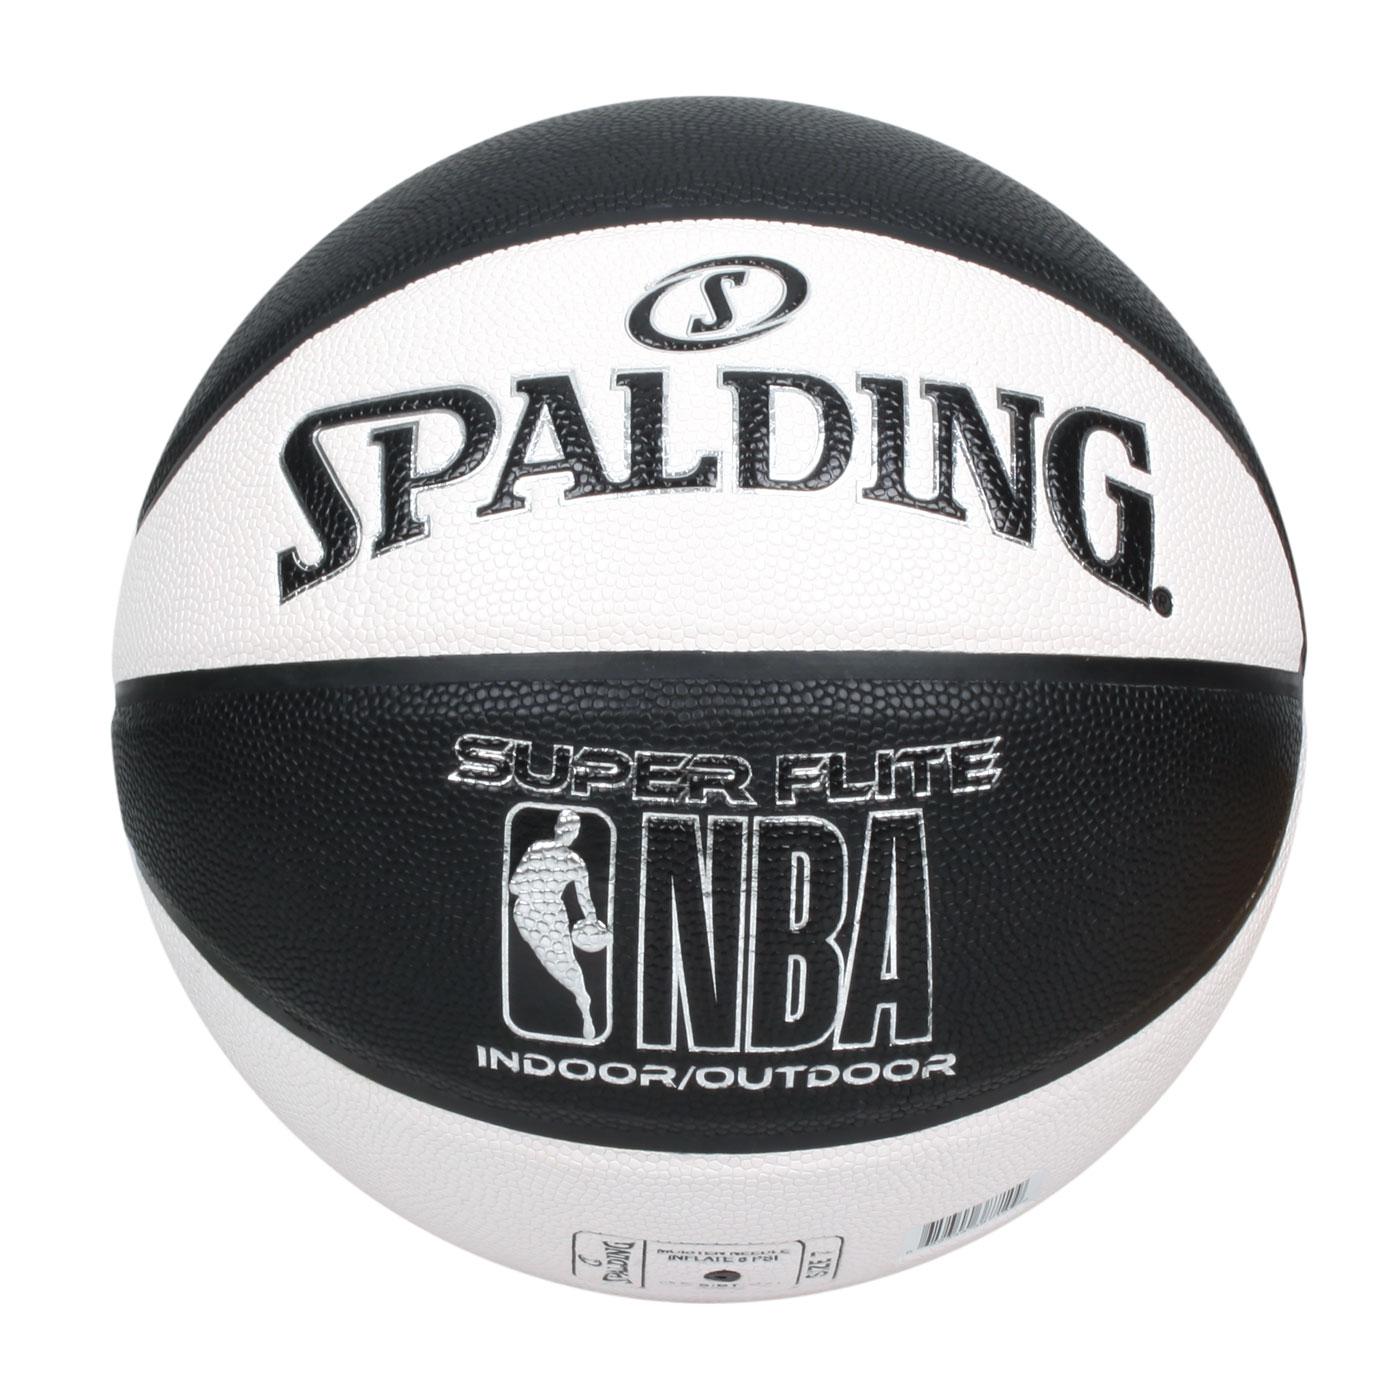 SPALDING NBA SUPER FLITE系列#7號合成皮籃球 SPA38710 SPA76351 - 白黑